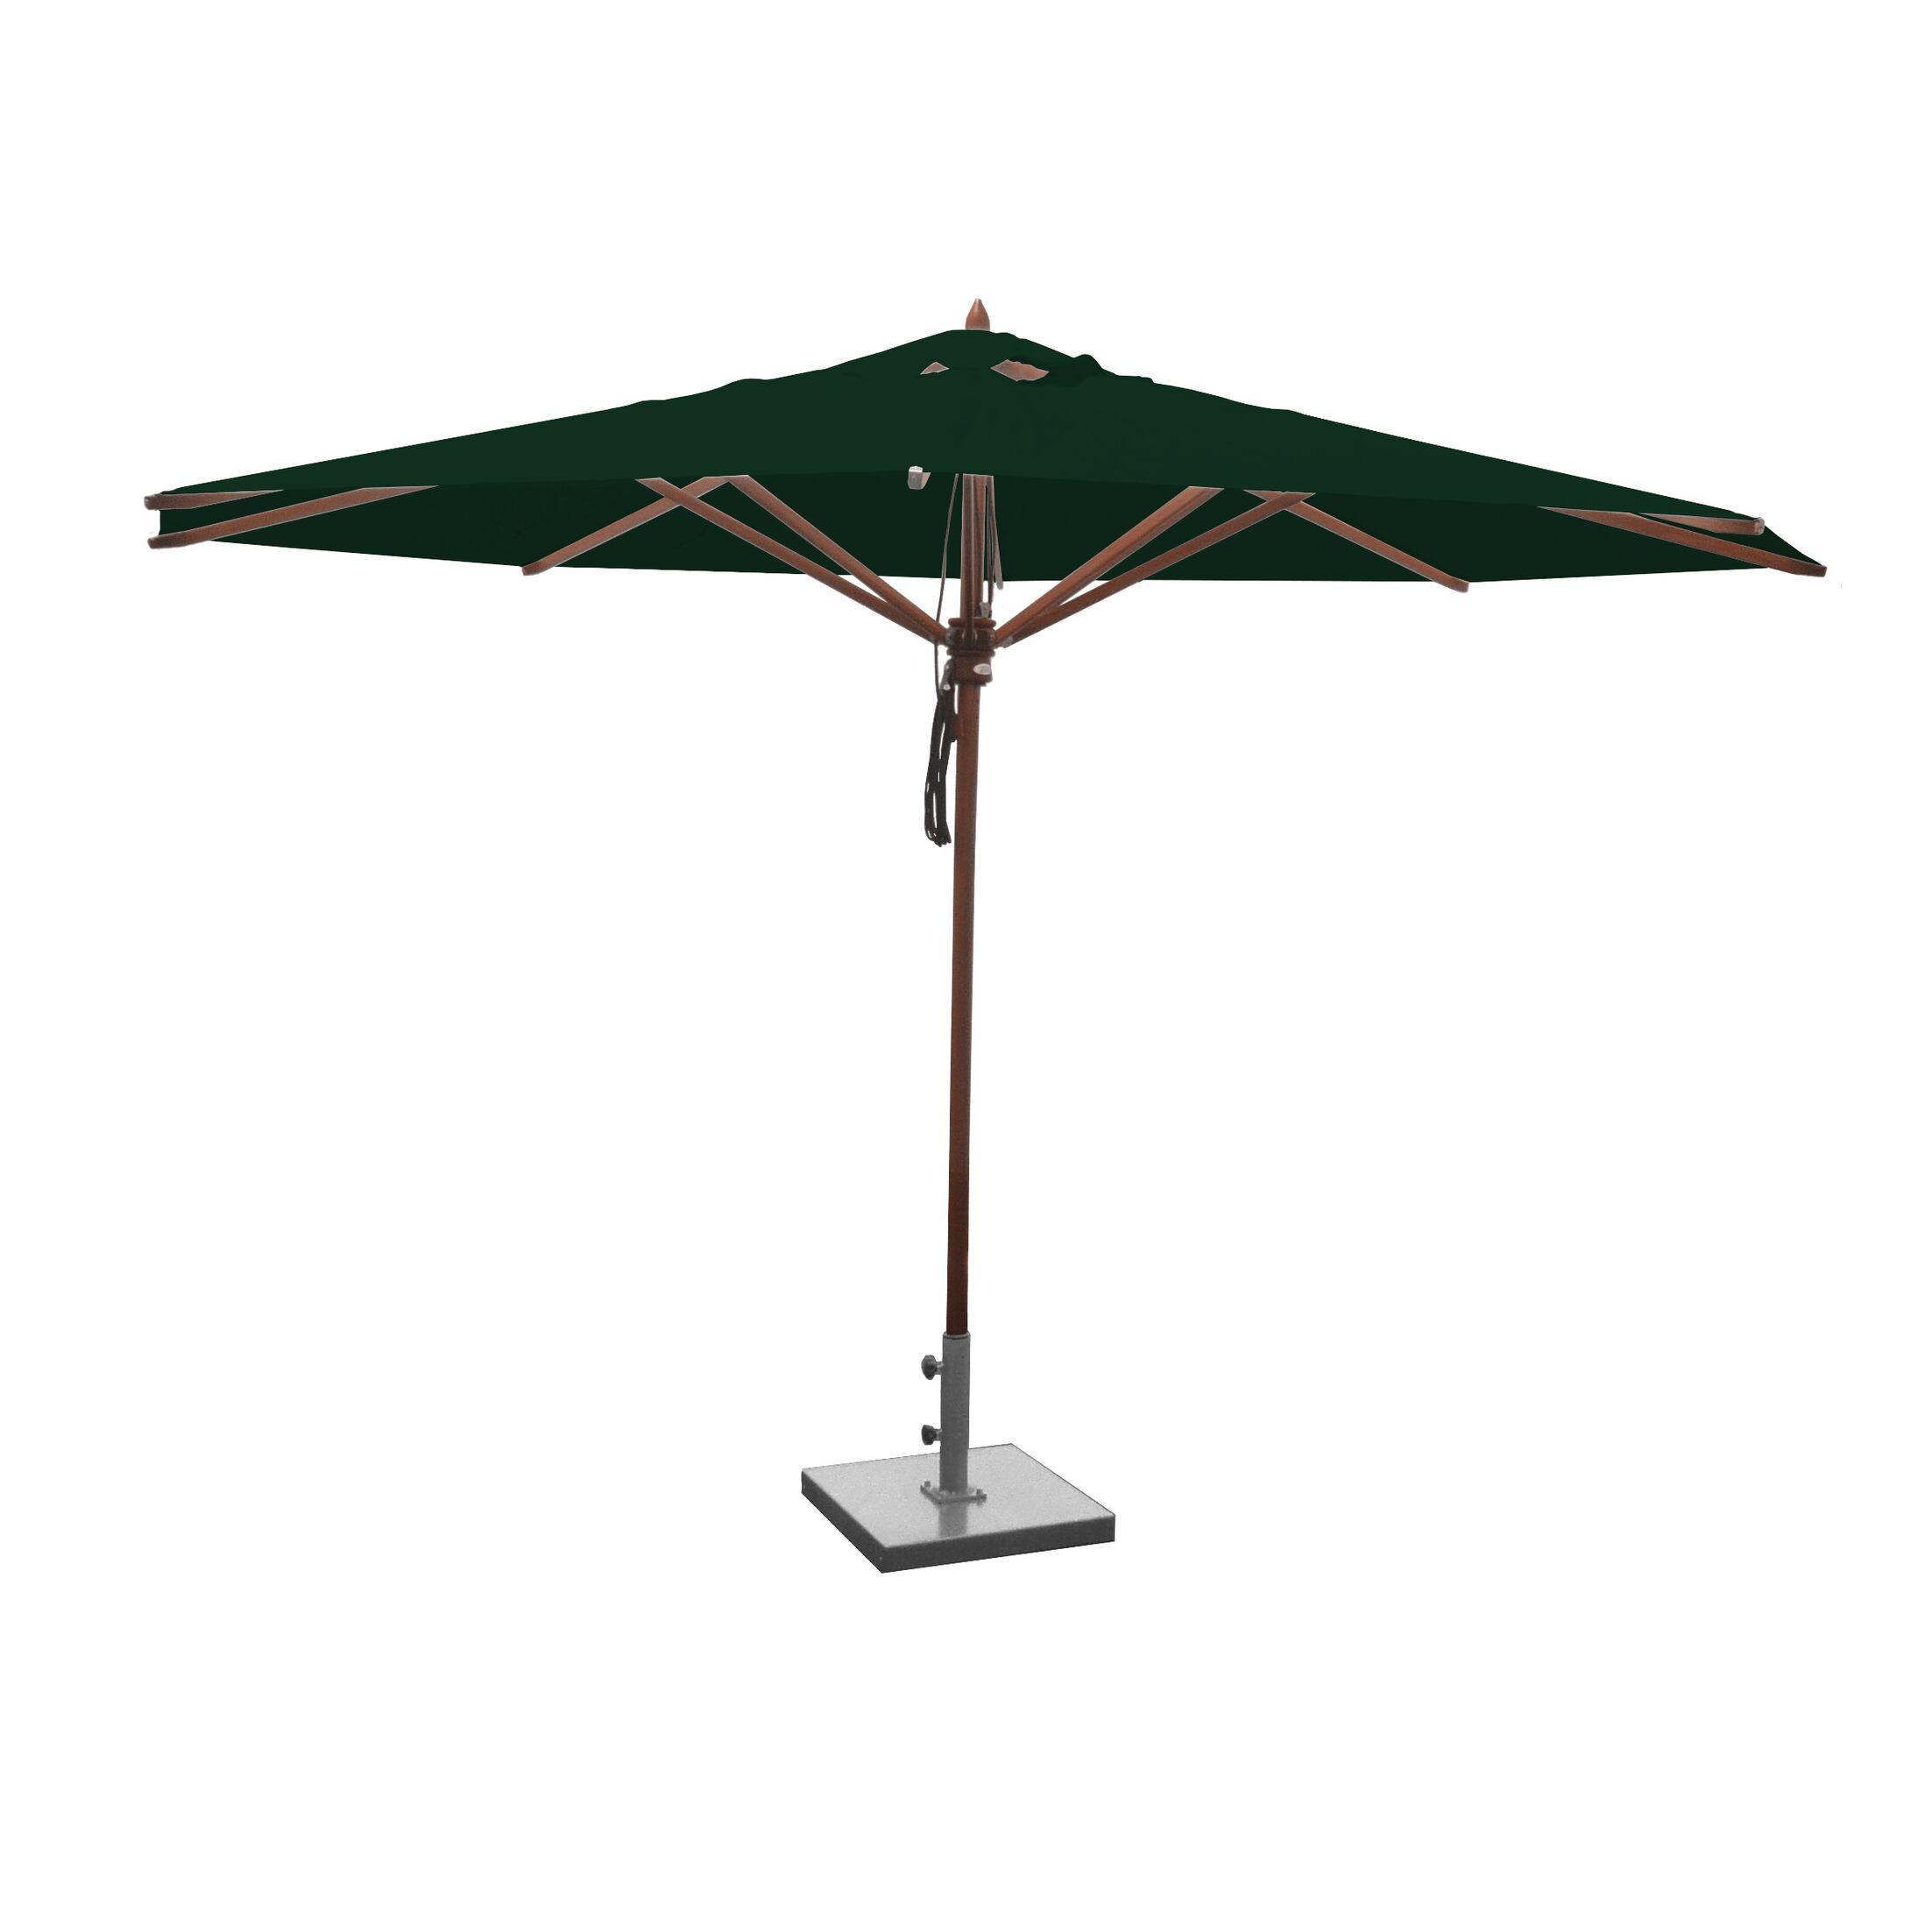 Samuel 13' Market Umbrella Fabric: Forest Green